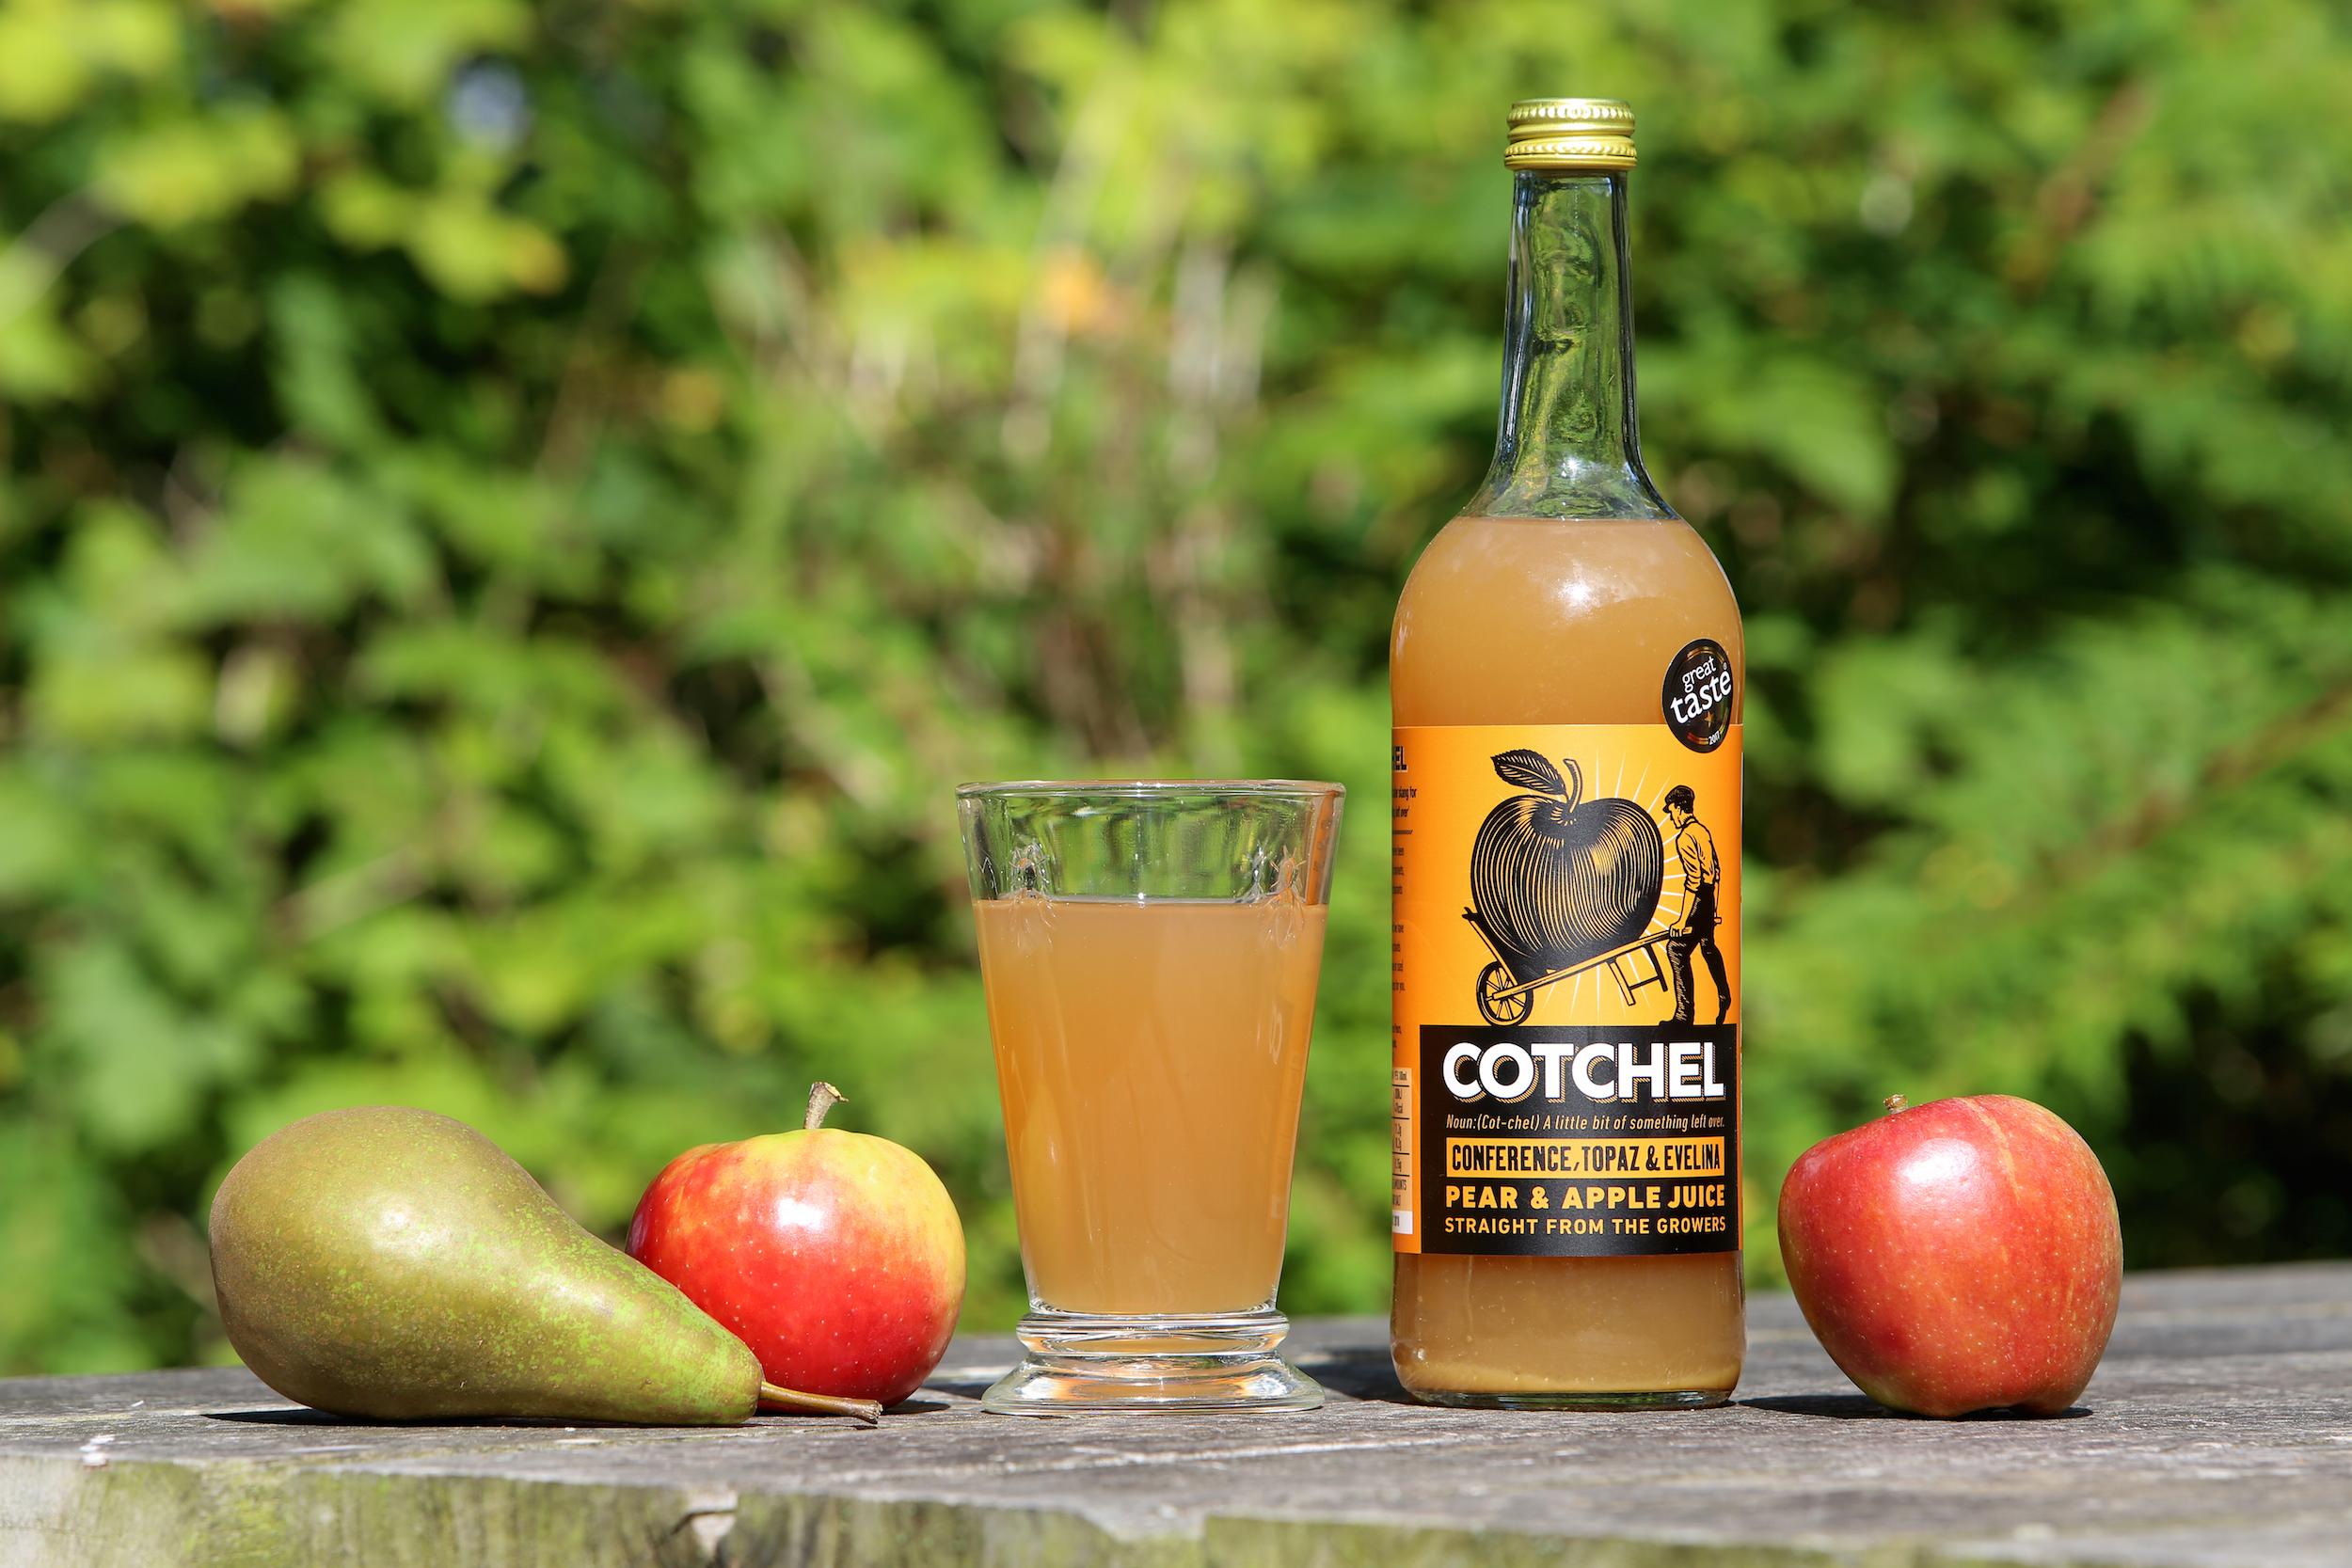 Cotchel Pear Apple Juice.jpg